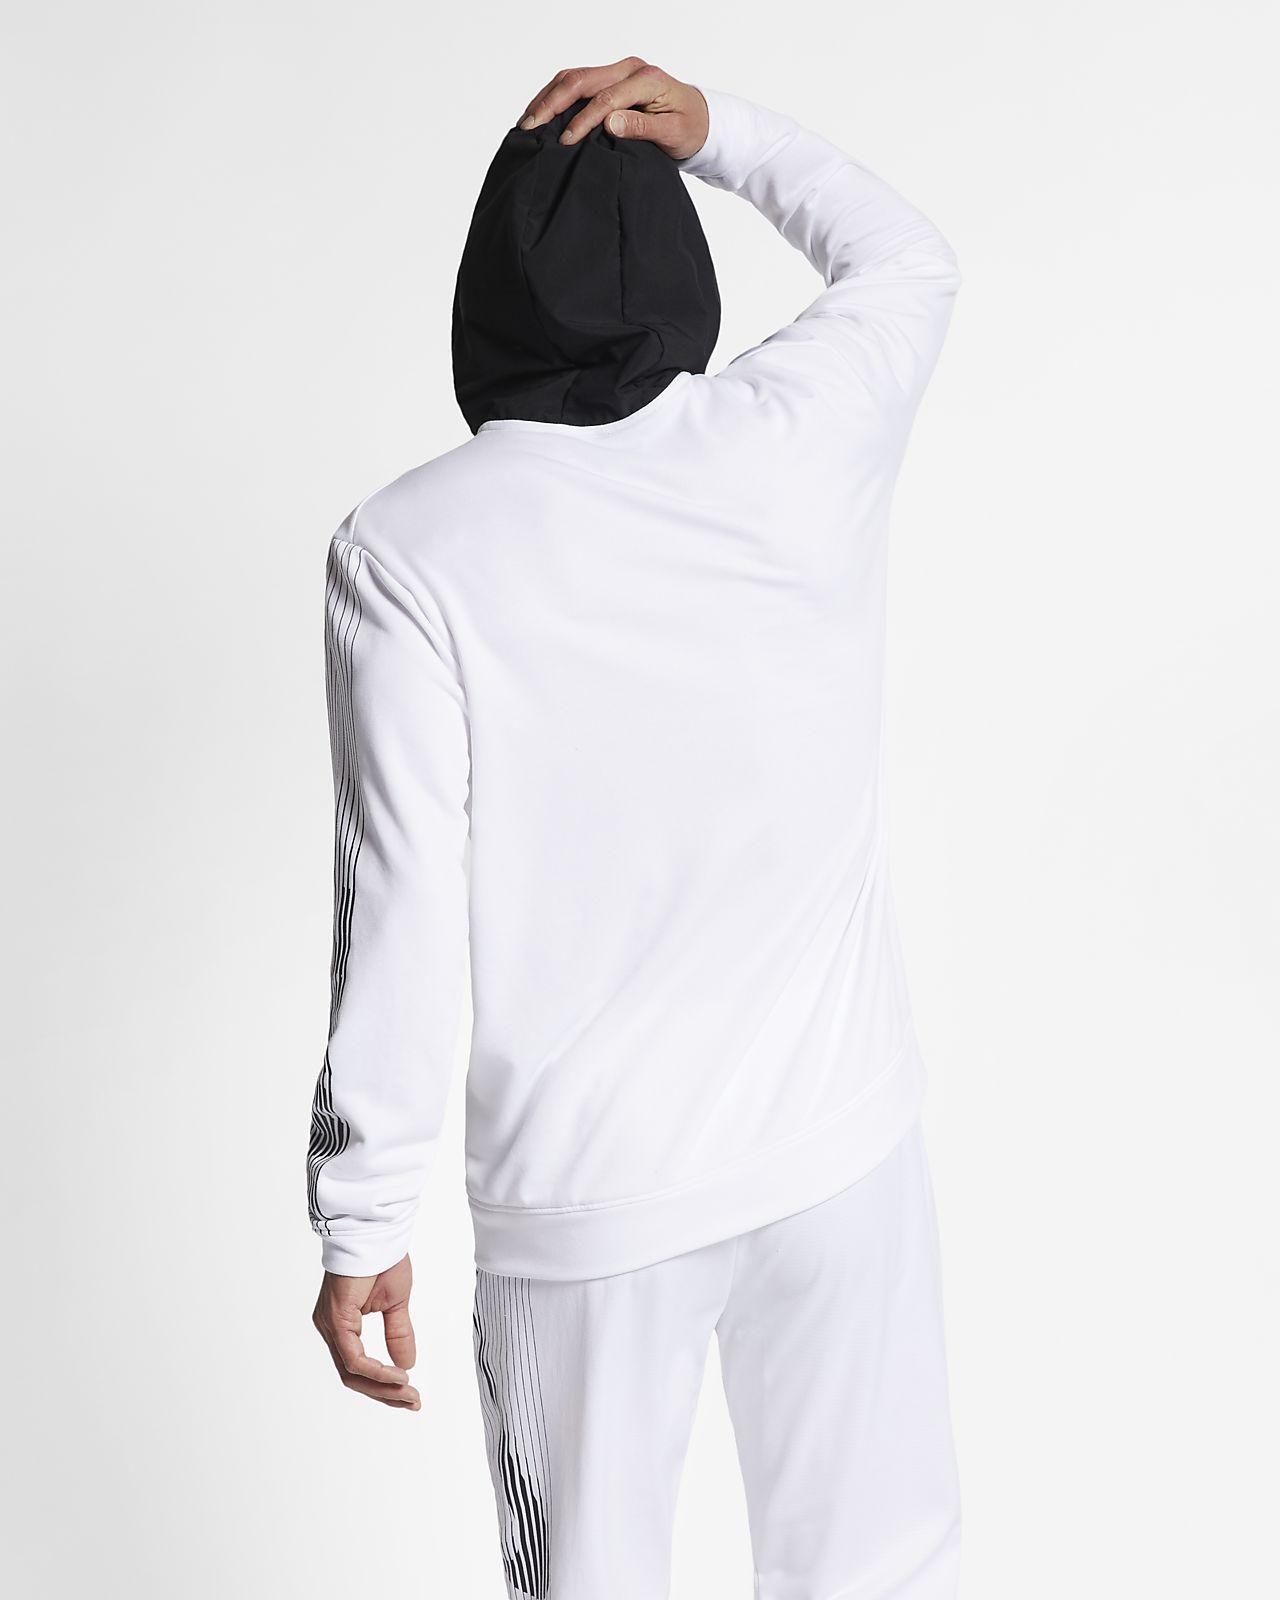 428ea1aad671 Nike Dri-FIT Men s Fleece Training Hoodie. Nike.com